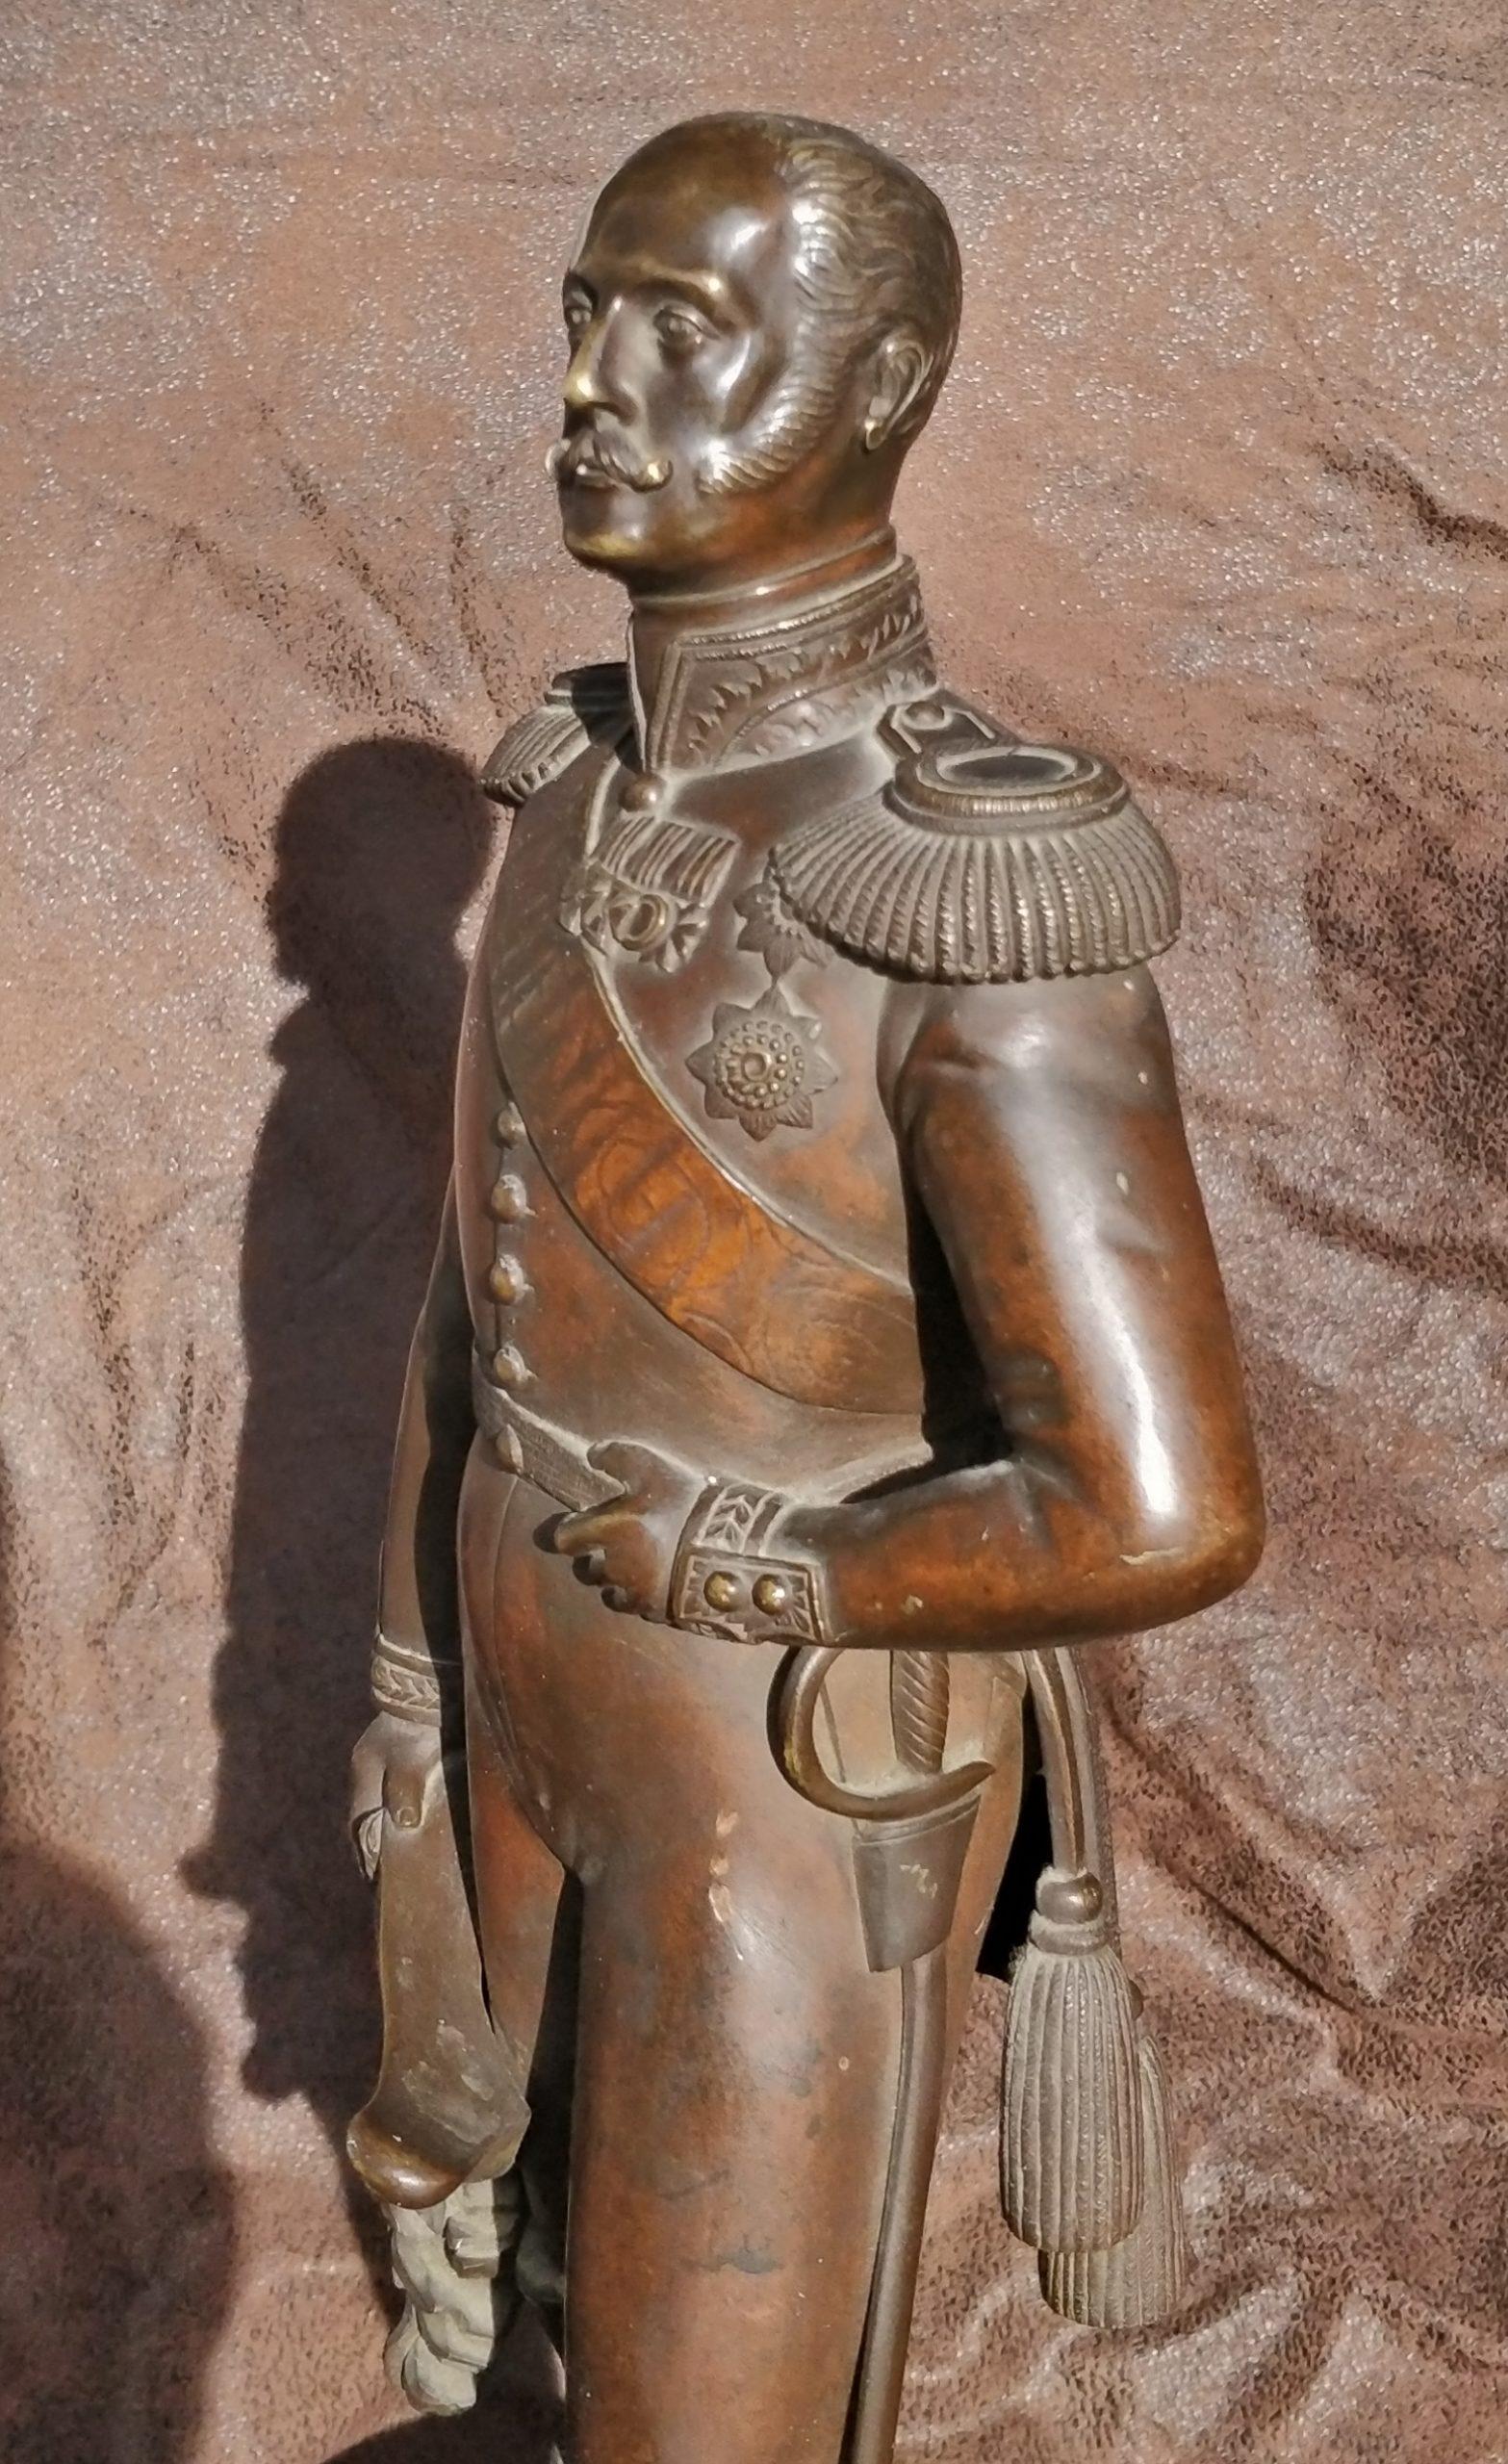 - Russian Tsar bronze Statue Николай первый бронза